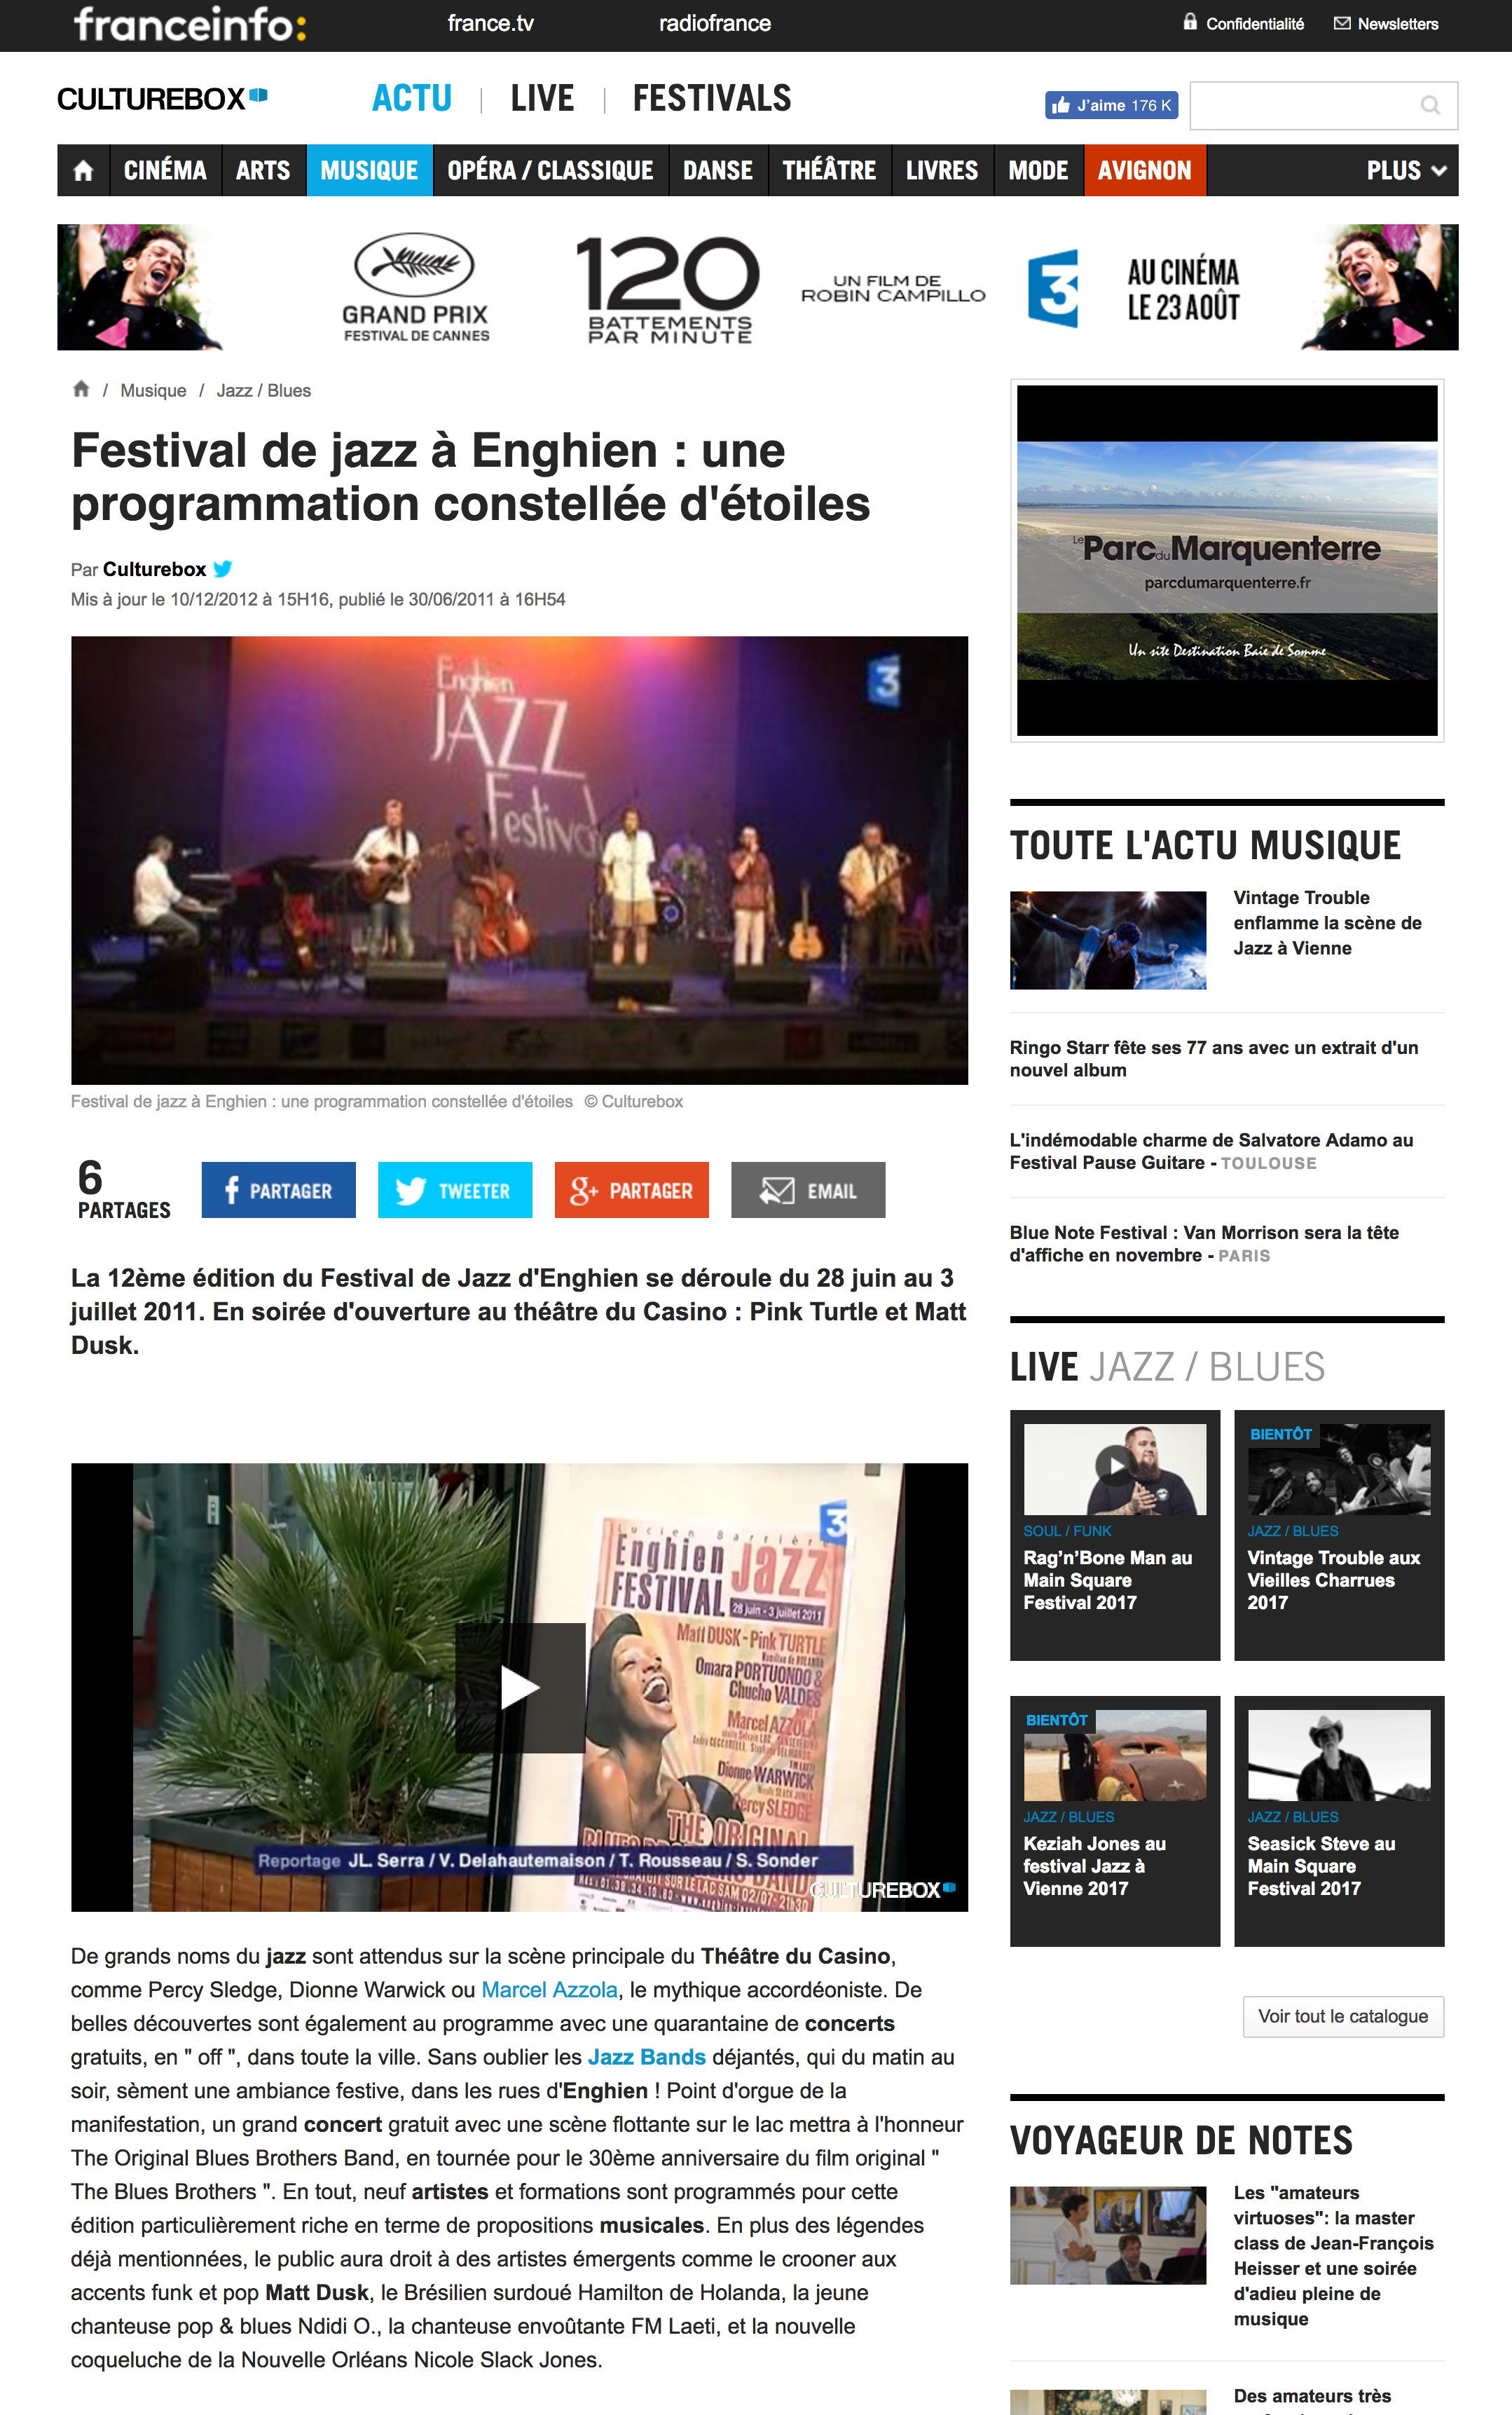 CULTUREBOXE FRANCE TV INFO